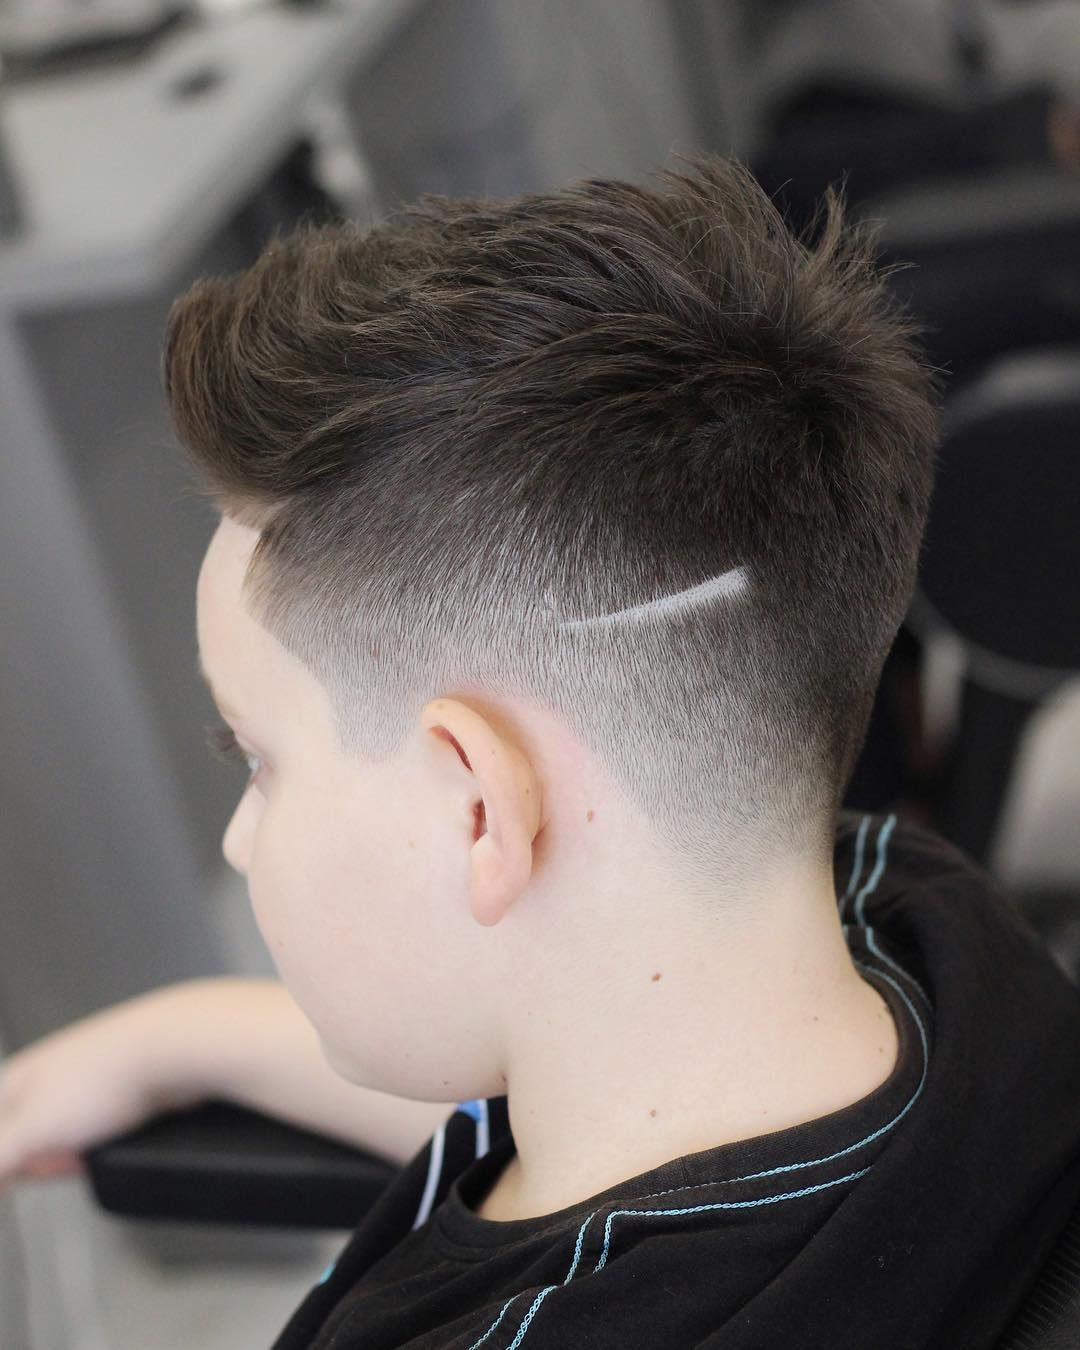 Top 12 Beautiful Hair Style Boys 2019 Boys Hairstyles Images Boy Hairstyles Hair Styles Mens Hairstyles